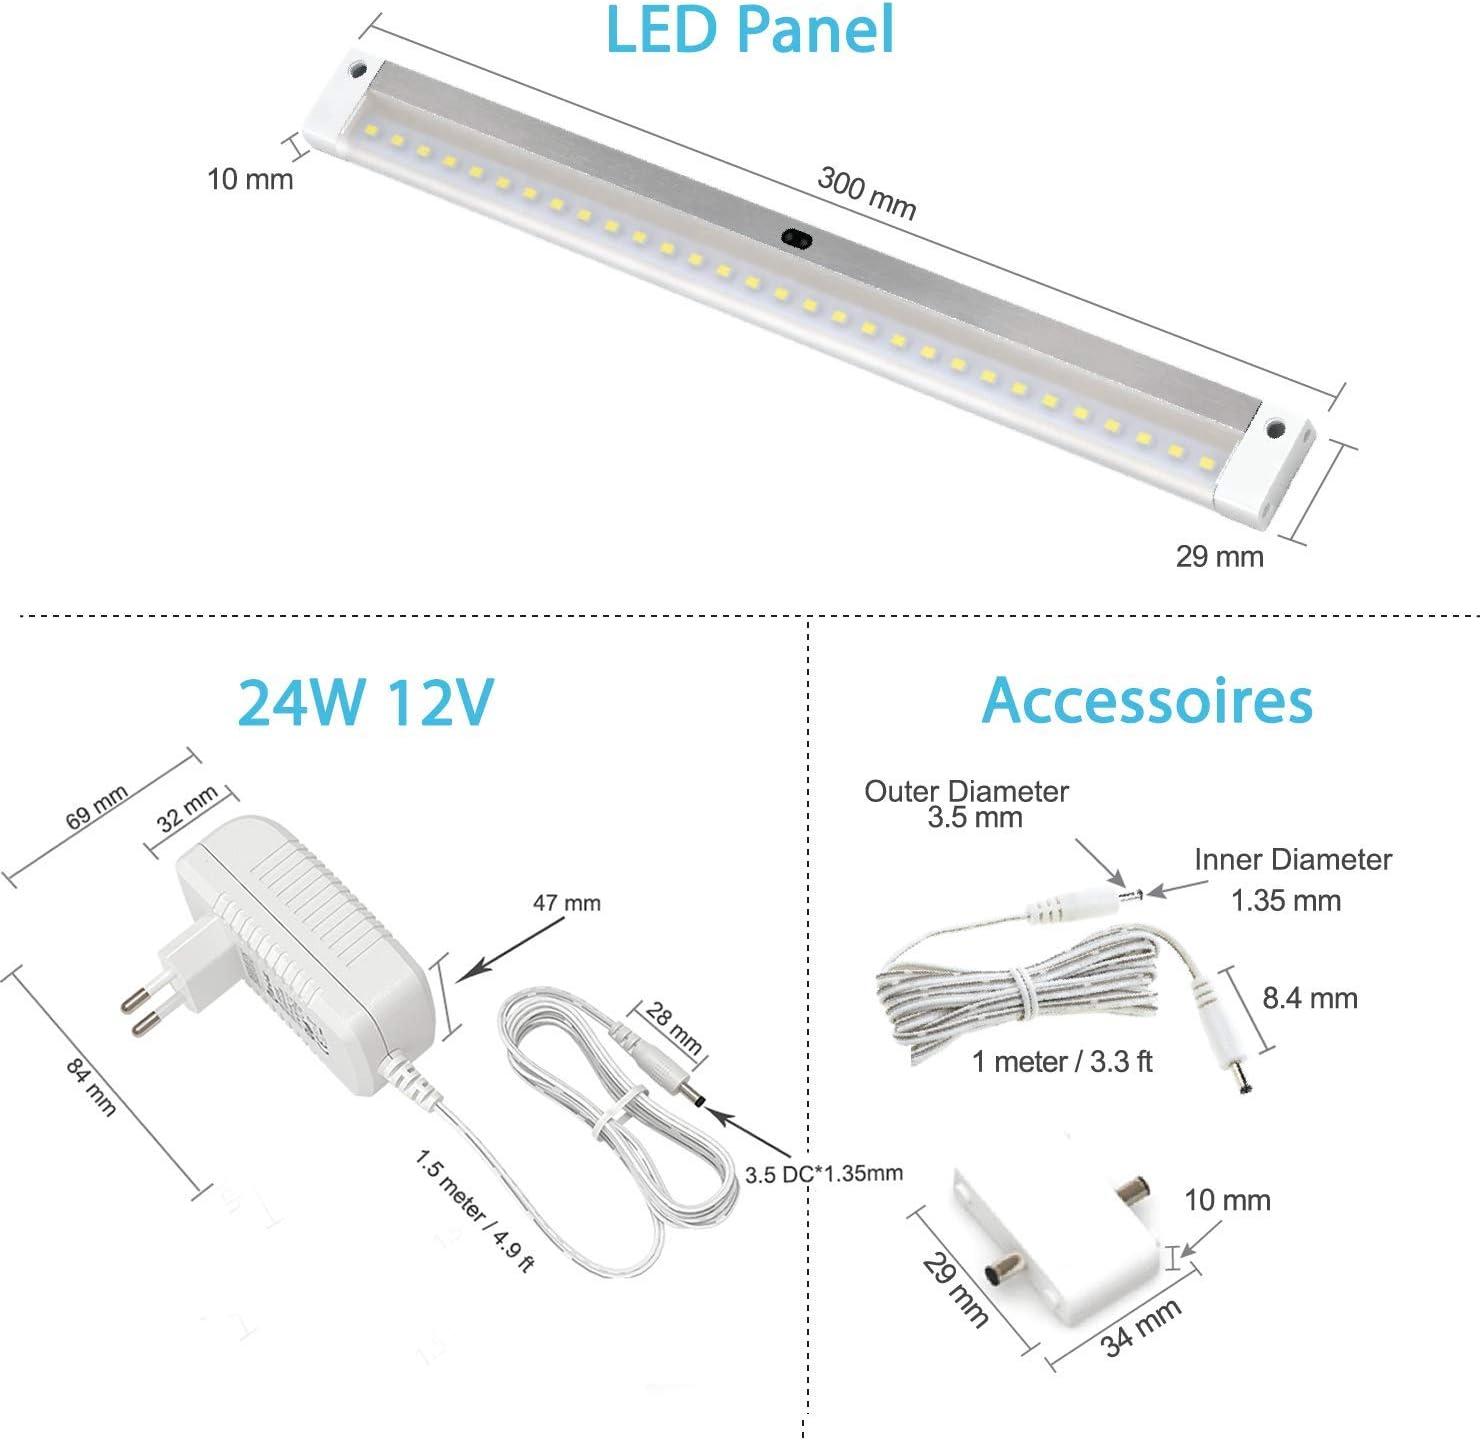 EShine 4 Panels 30 cm LED Dimmbares Unterbauleuchten-Set, Aktivierbar per Handbewegung - Berührungslose Dimm-Kontrolle - Deluxe Set, Warmweiß (3000K) Kaltweiß (6000k)